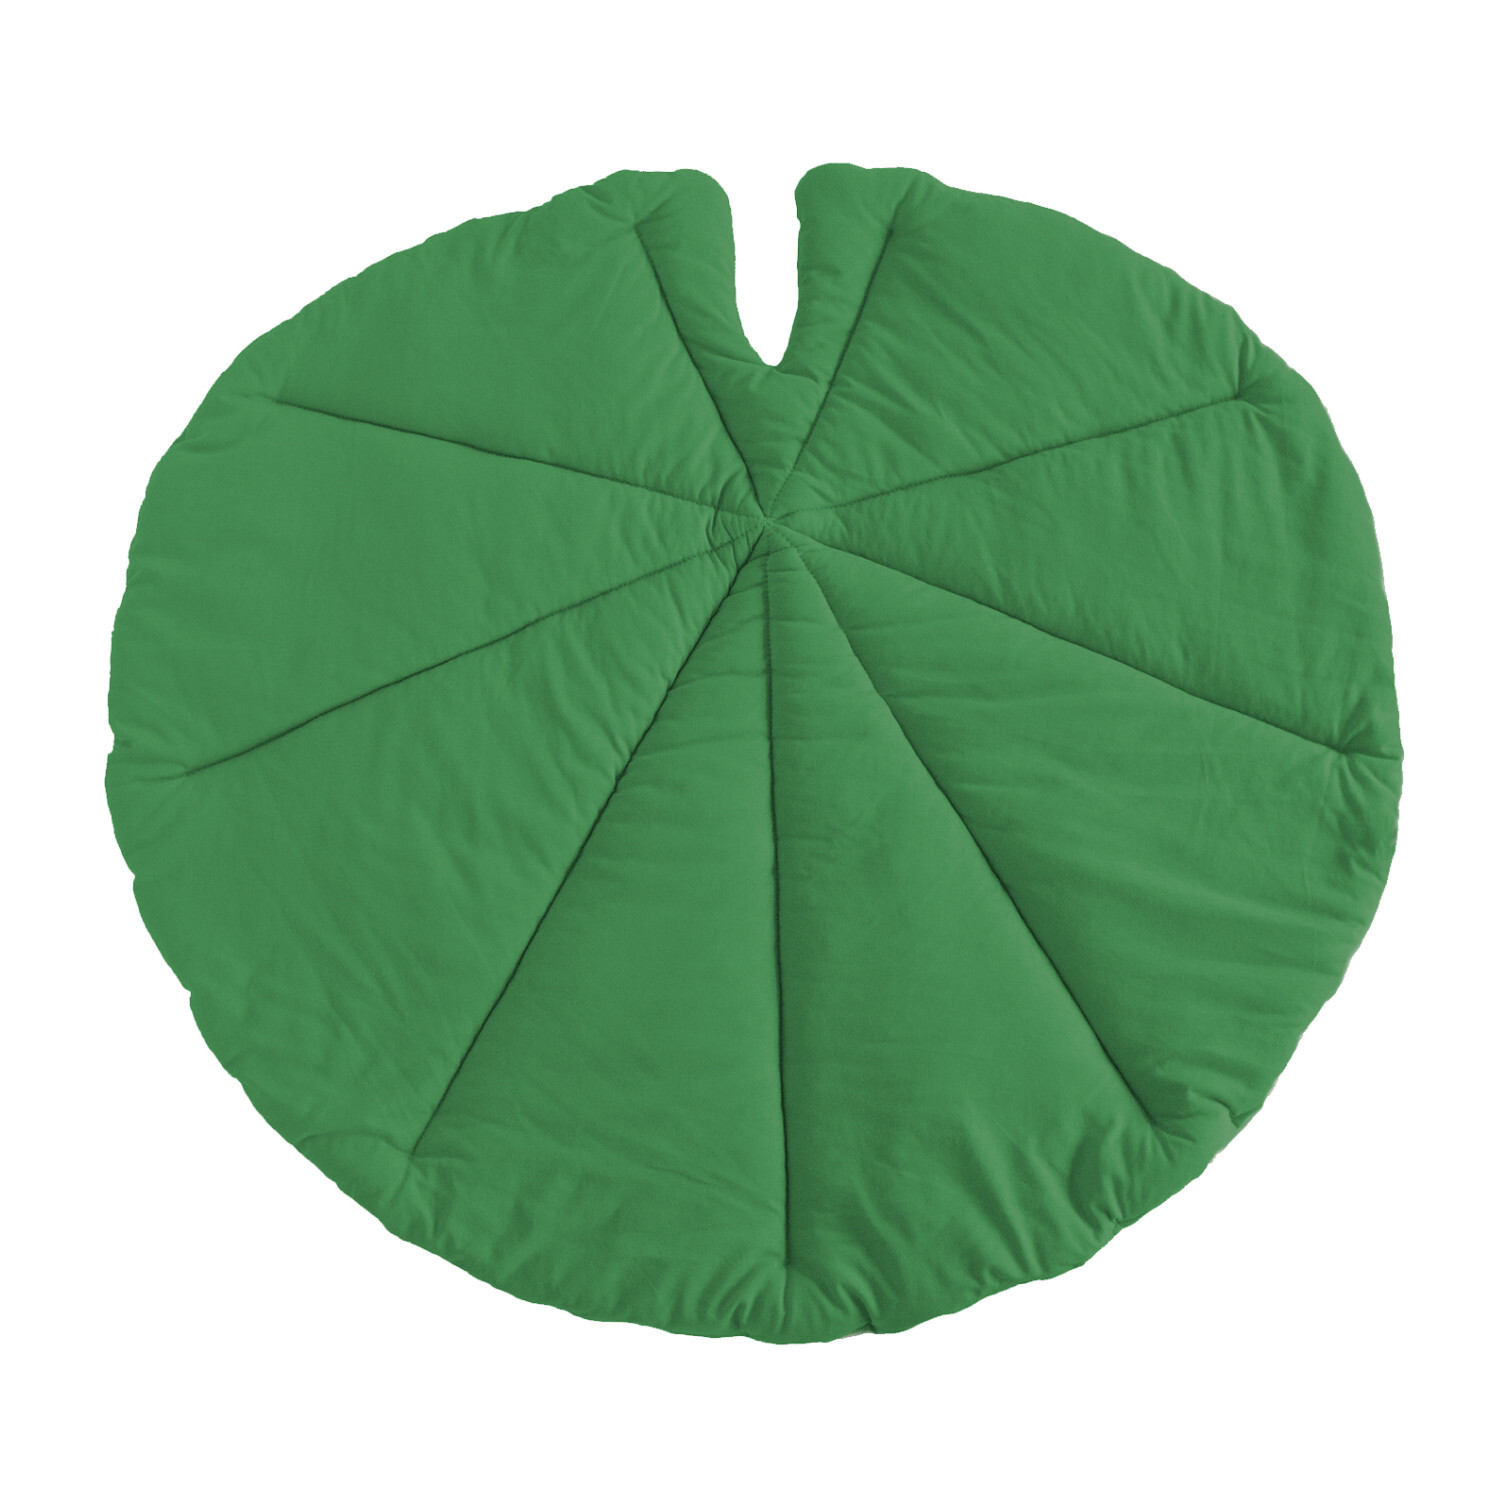 Lily Pad Playmat, Emerald